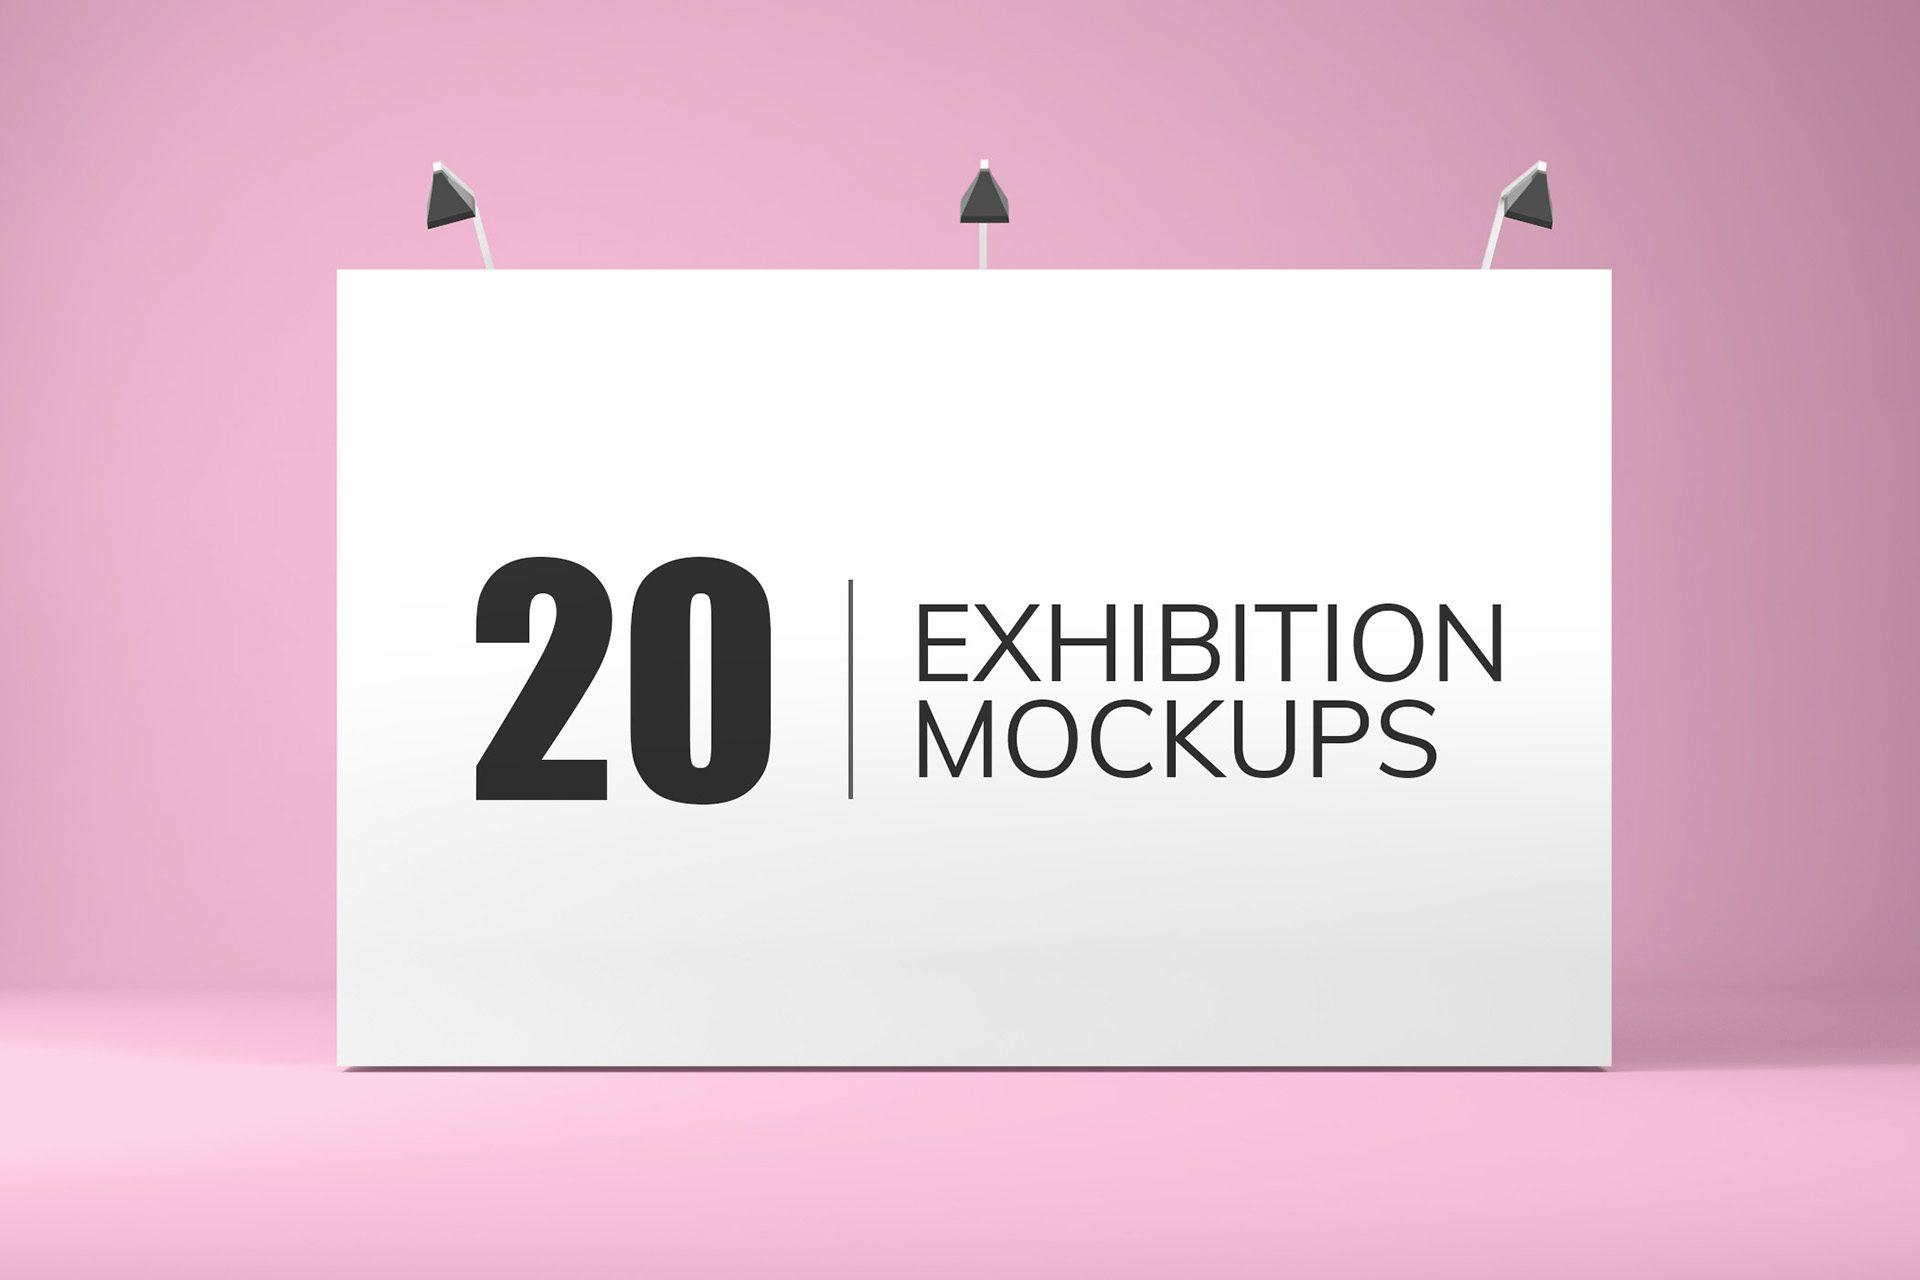 exhibition-mockups